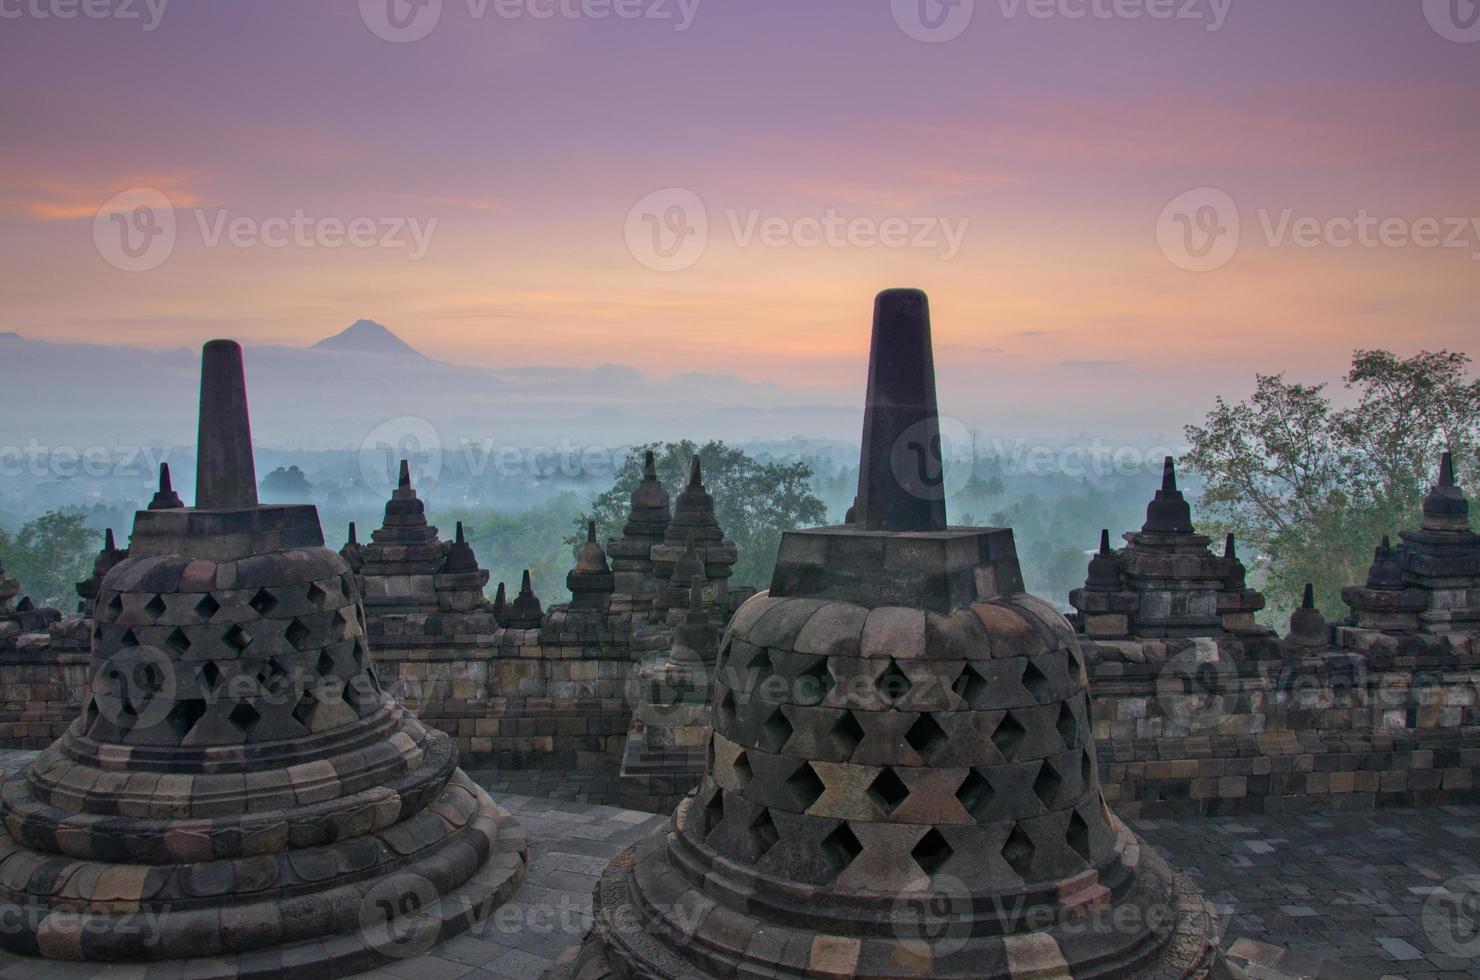 Sonnenaufgang Borobudur Tempel Stupa in Yogyakarta, Java, Indonesien. foto